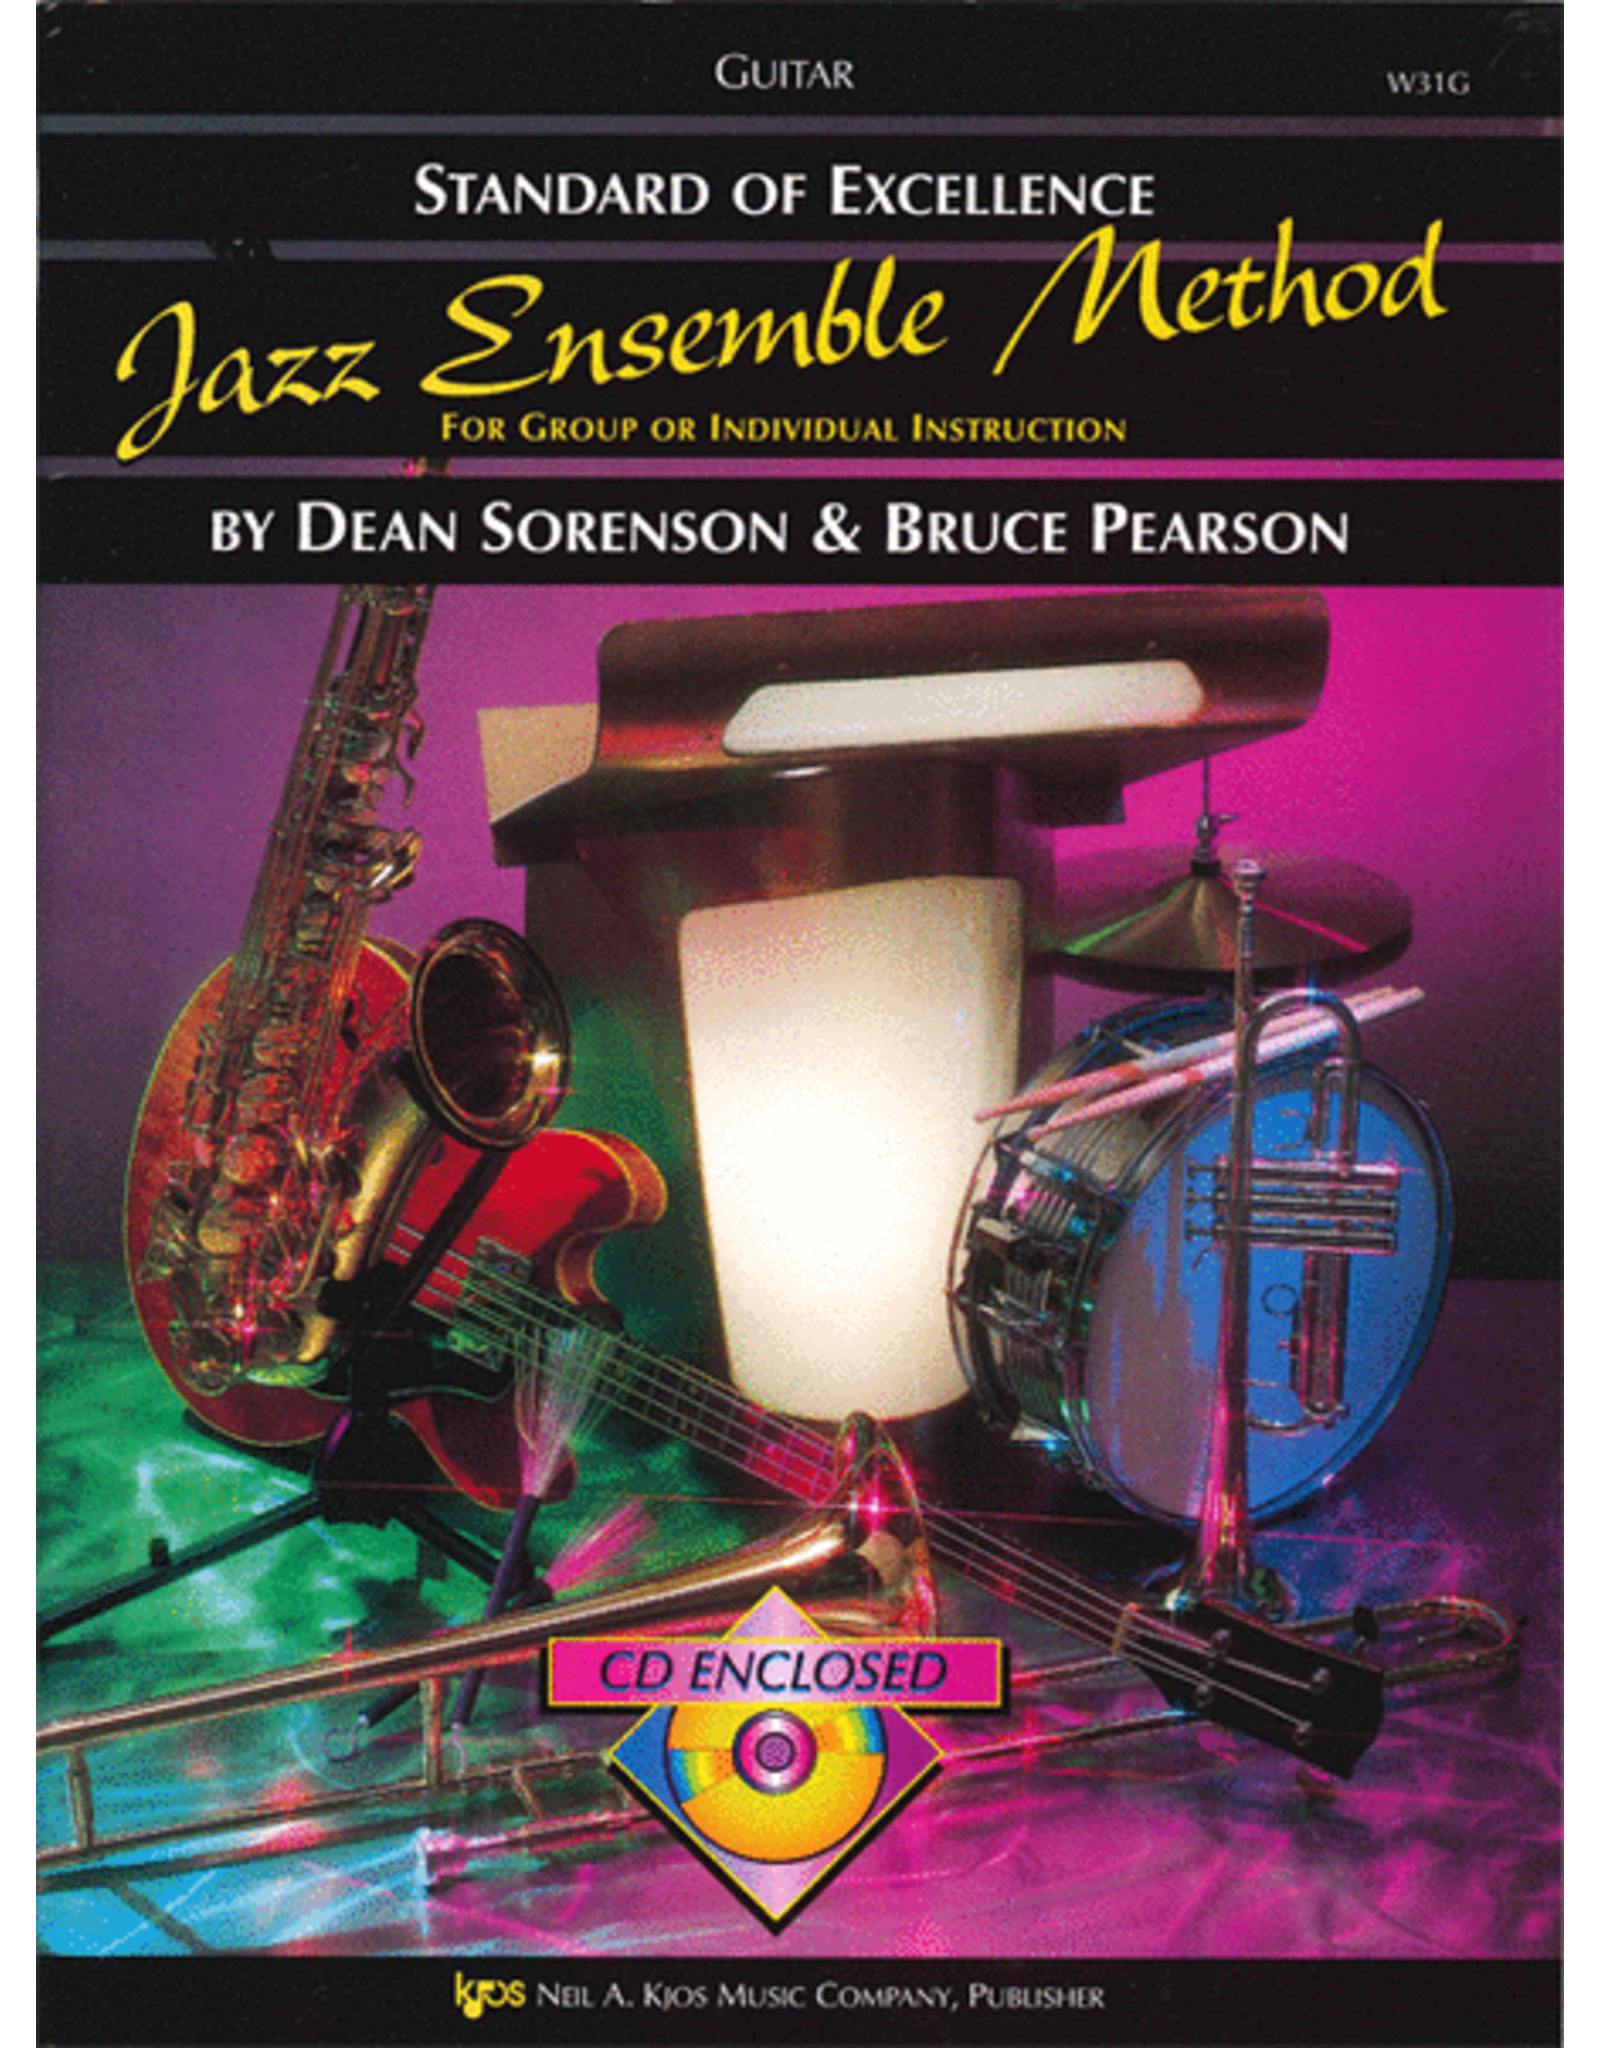 Standard of Excellence Standard of Excellence Jazz Ensemble Method Guitar